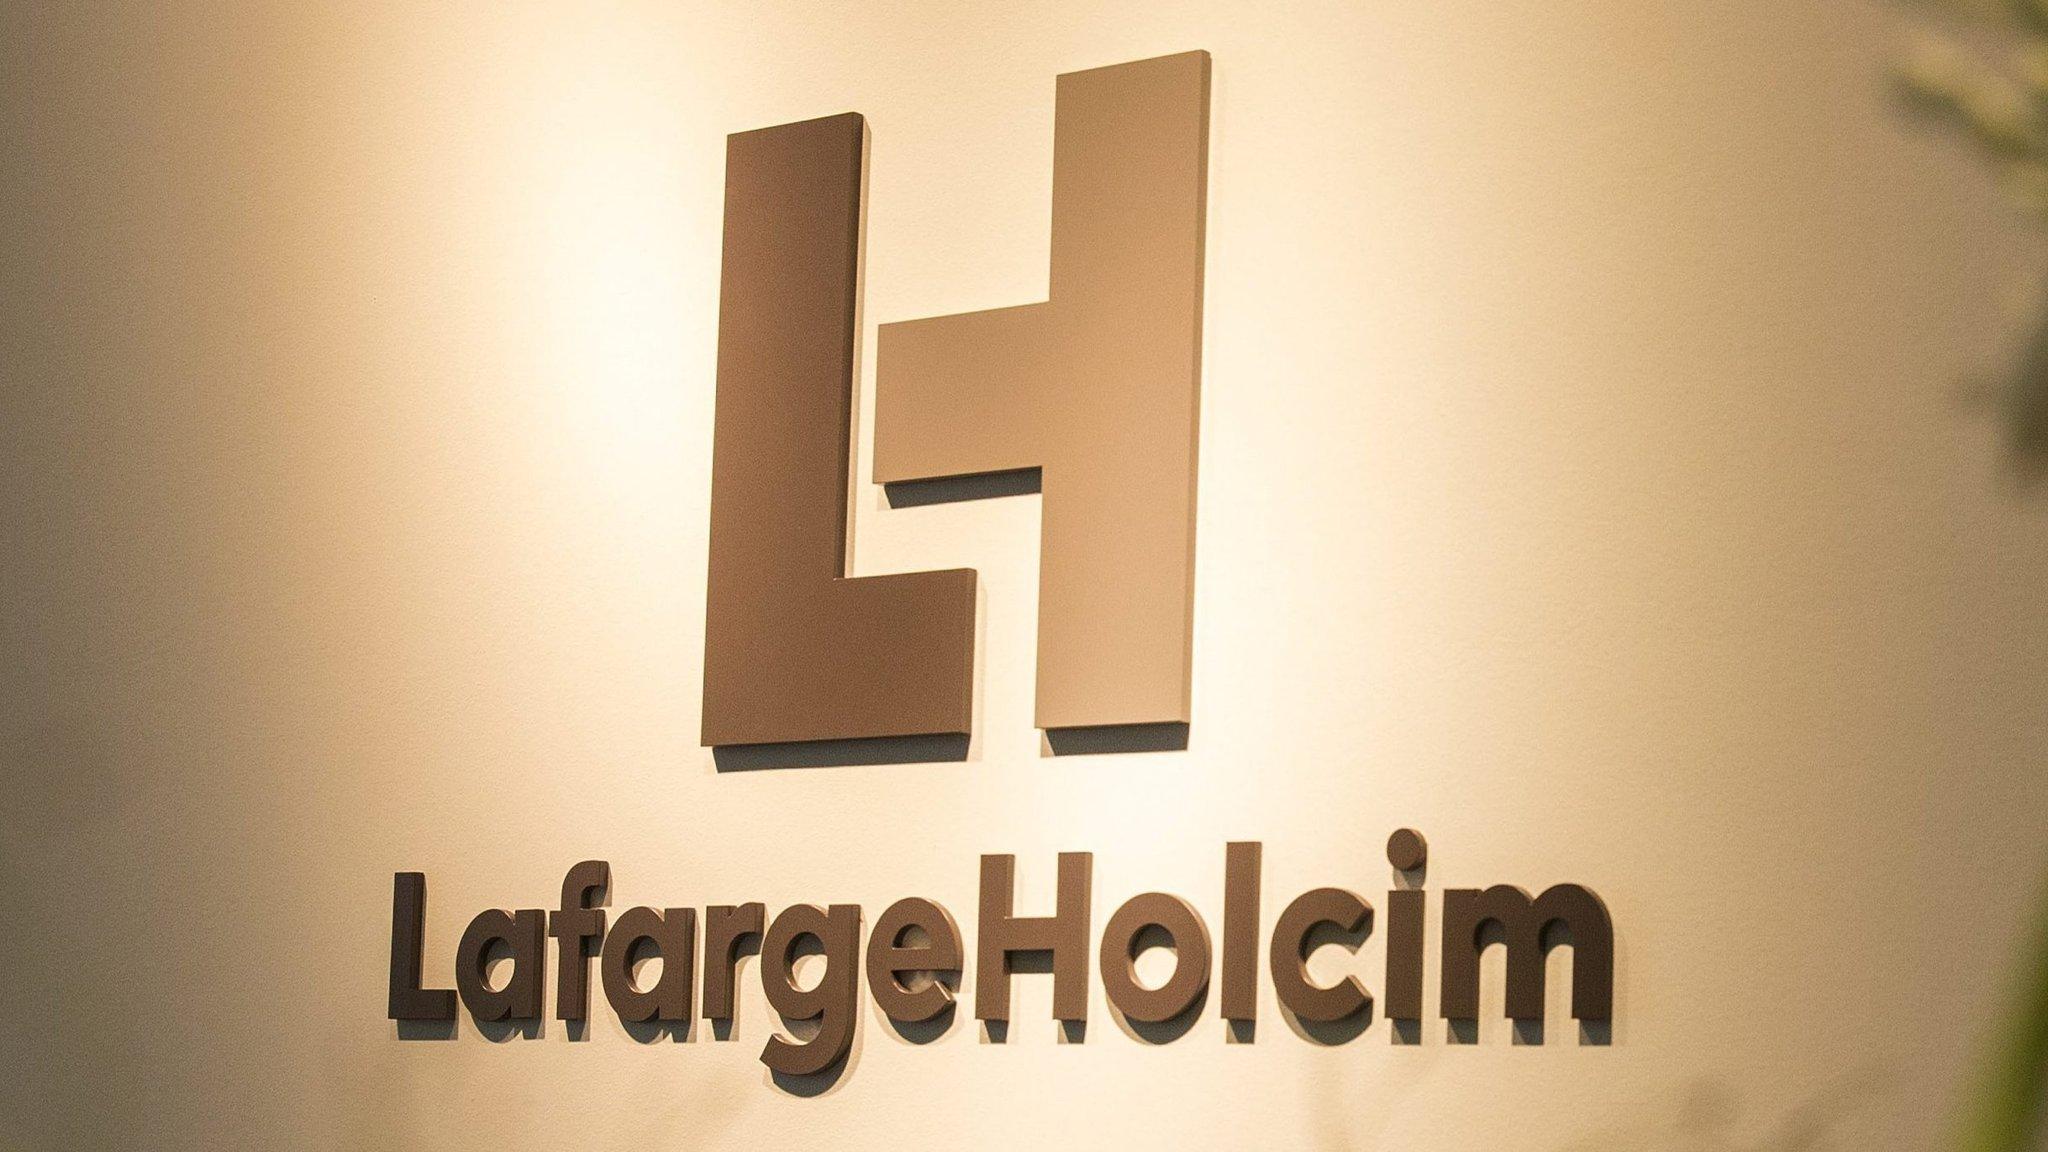 LafargeHolcim executives under investigation